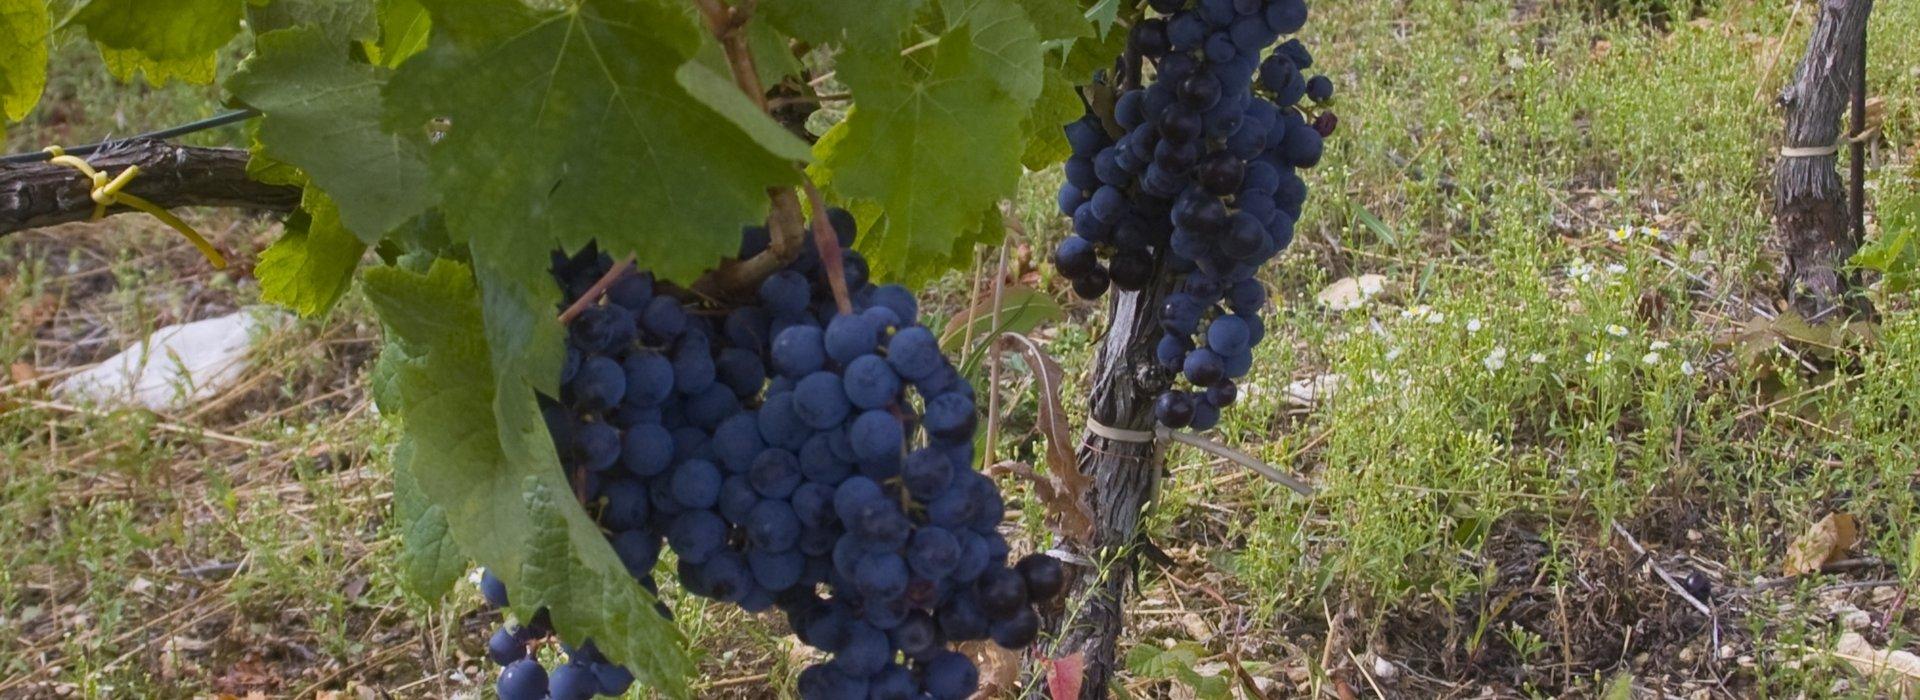 Balatonfüred wine region